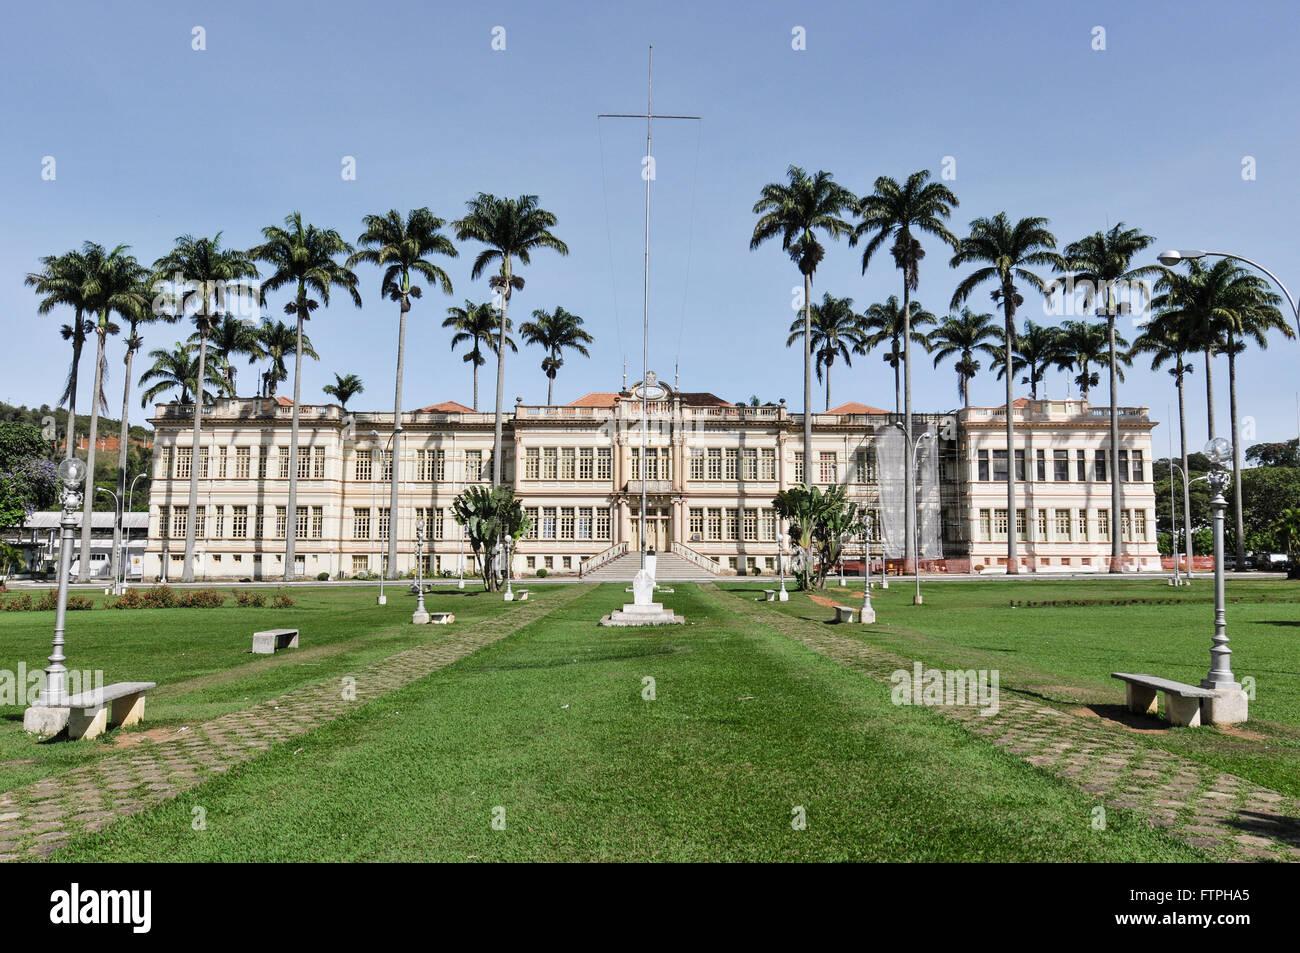 Building known as Arthur Bernardes Bernardao in the Federal University of Vicosa UFV campus - Stock Image